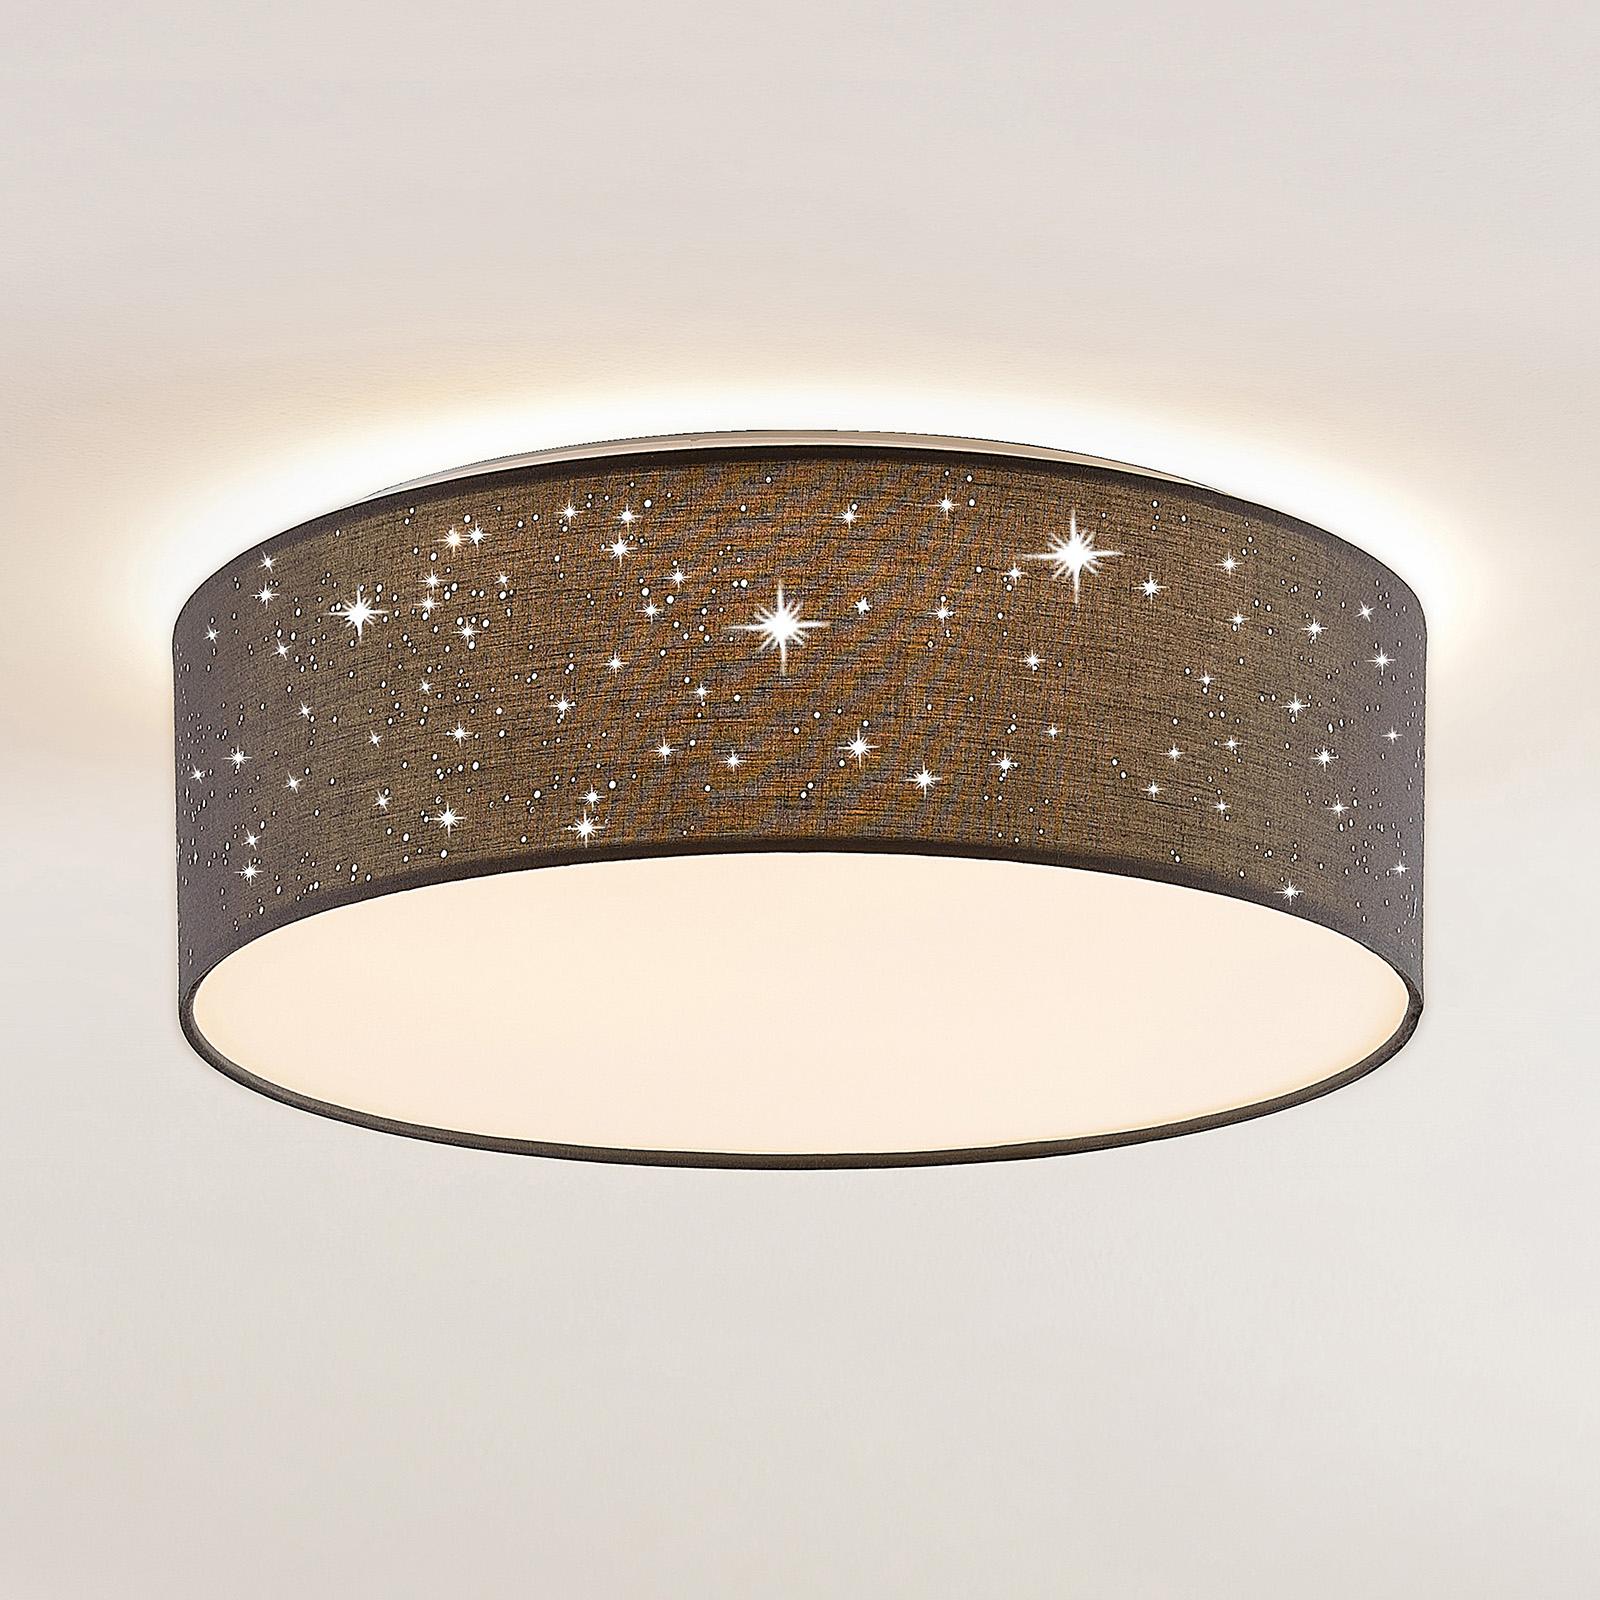 Lindby Ellamina LED-Deckenleuchte 40 cm dunkelgrau